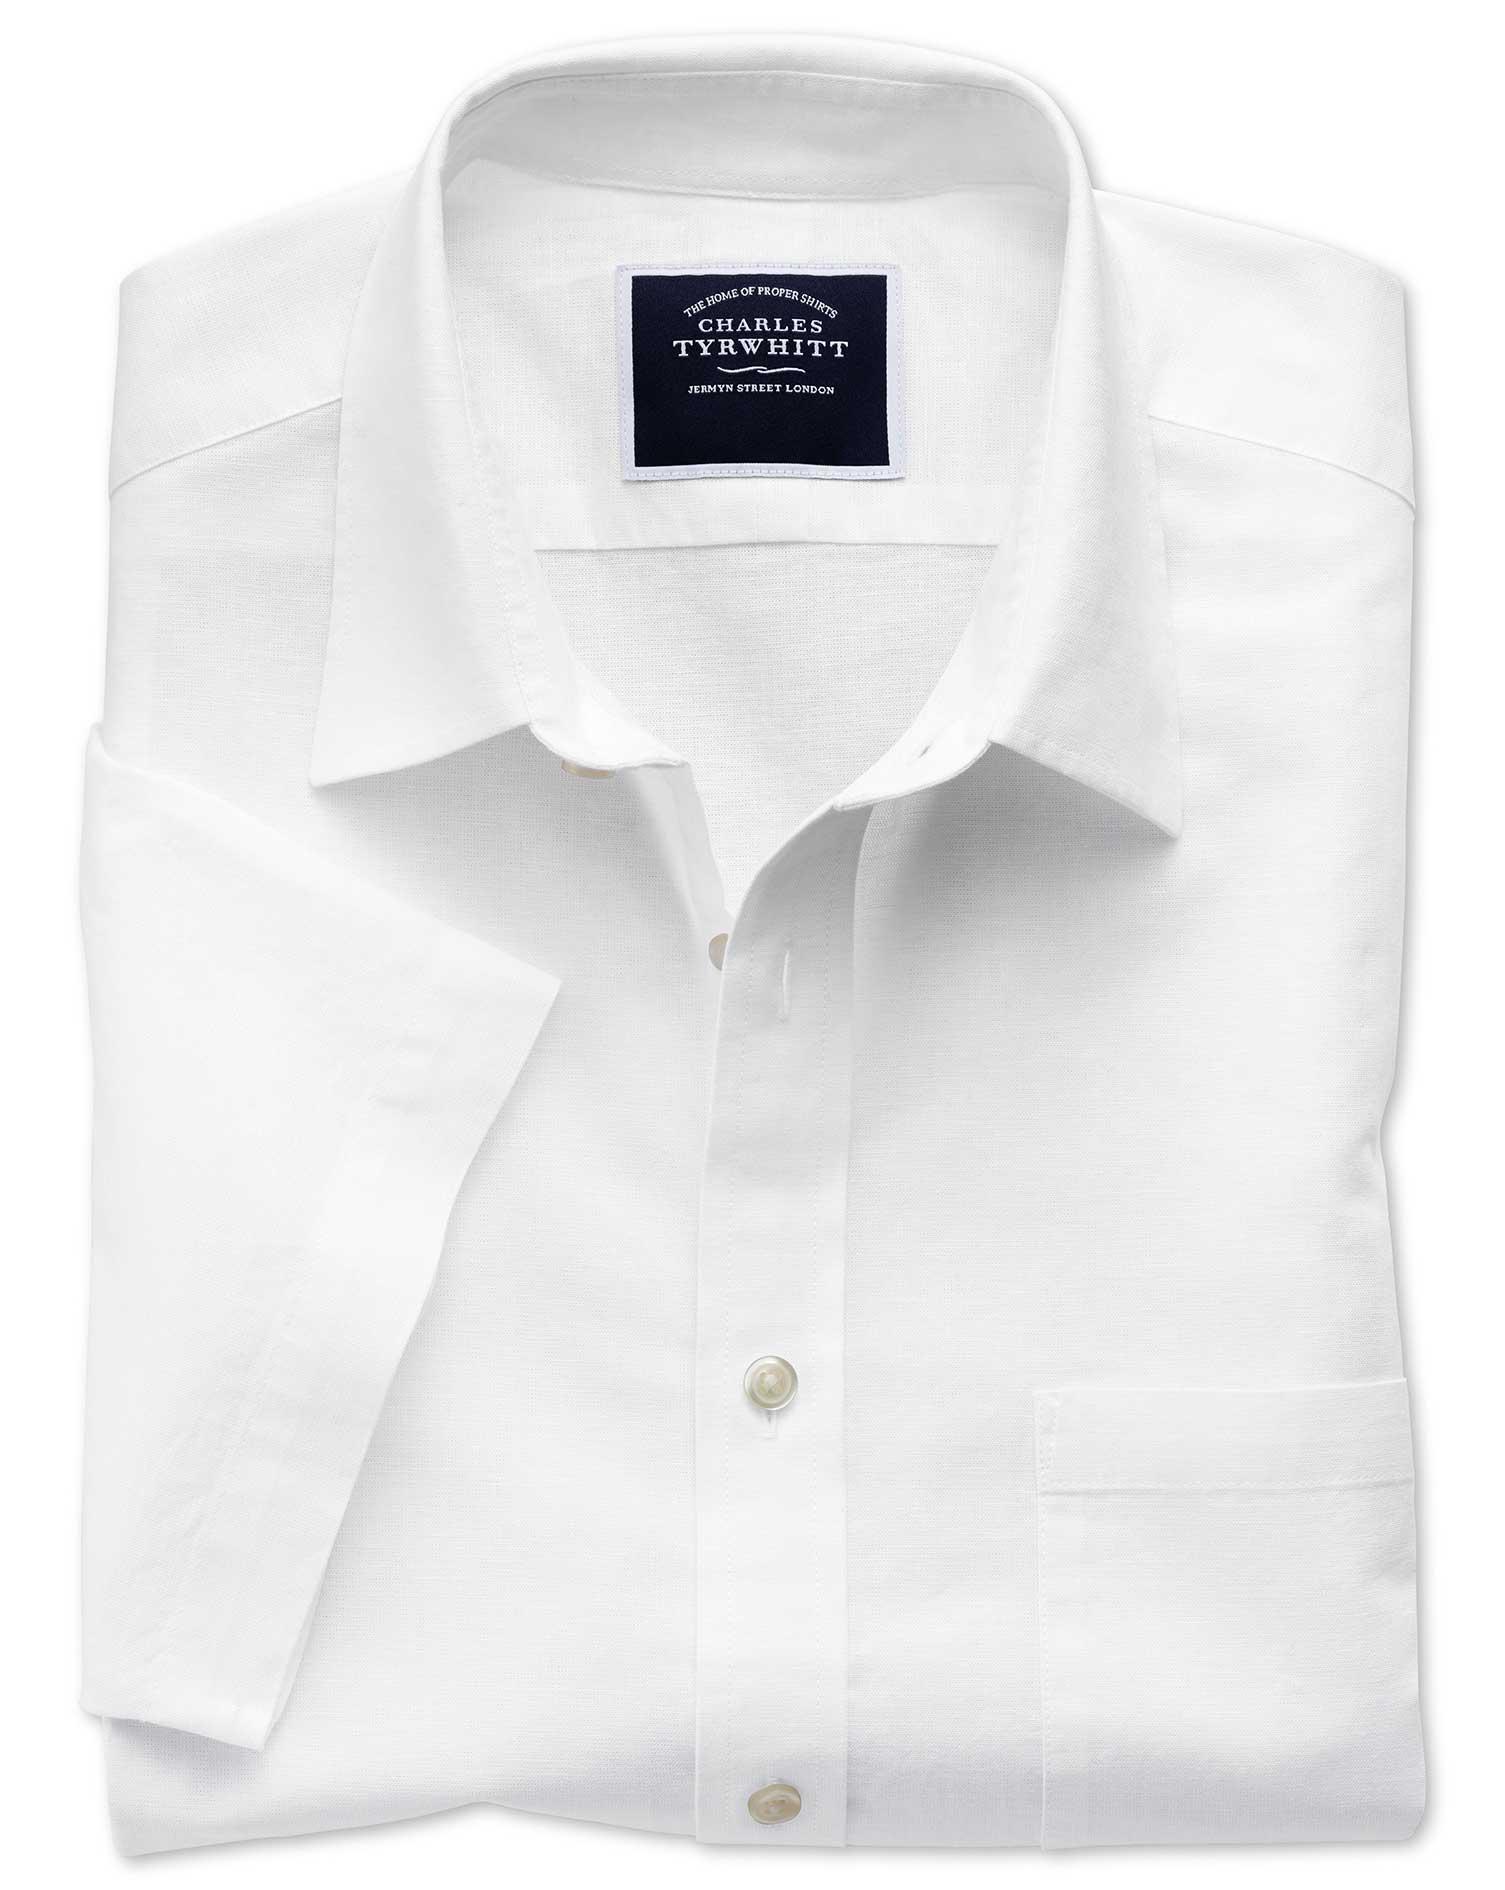 slim fit white cotton linen short sleeve cotton linen mix casual shirt single cuff size xs by charles tyrwhitt